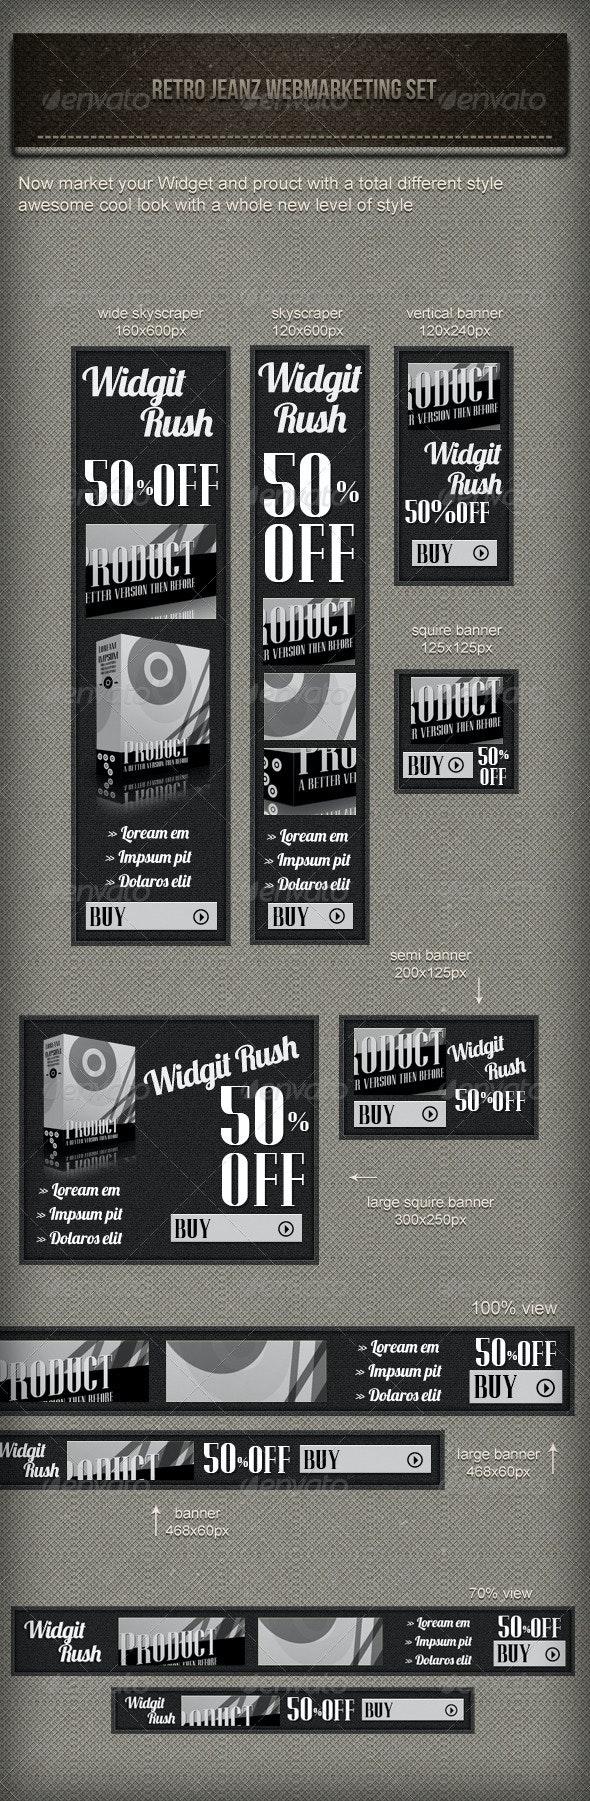 Retro Jeans Web Marketing Set